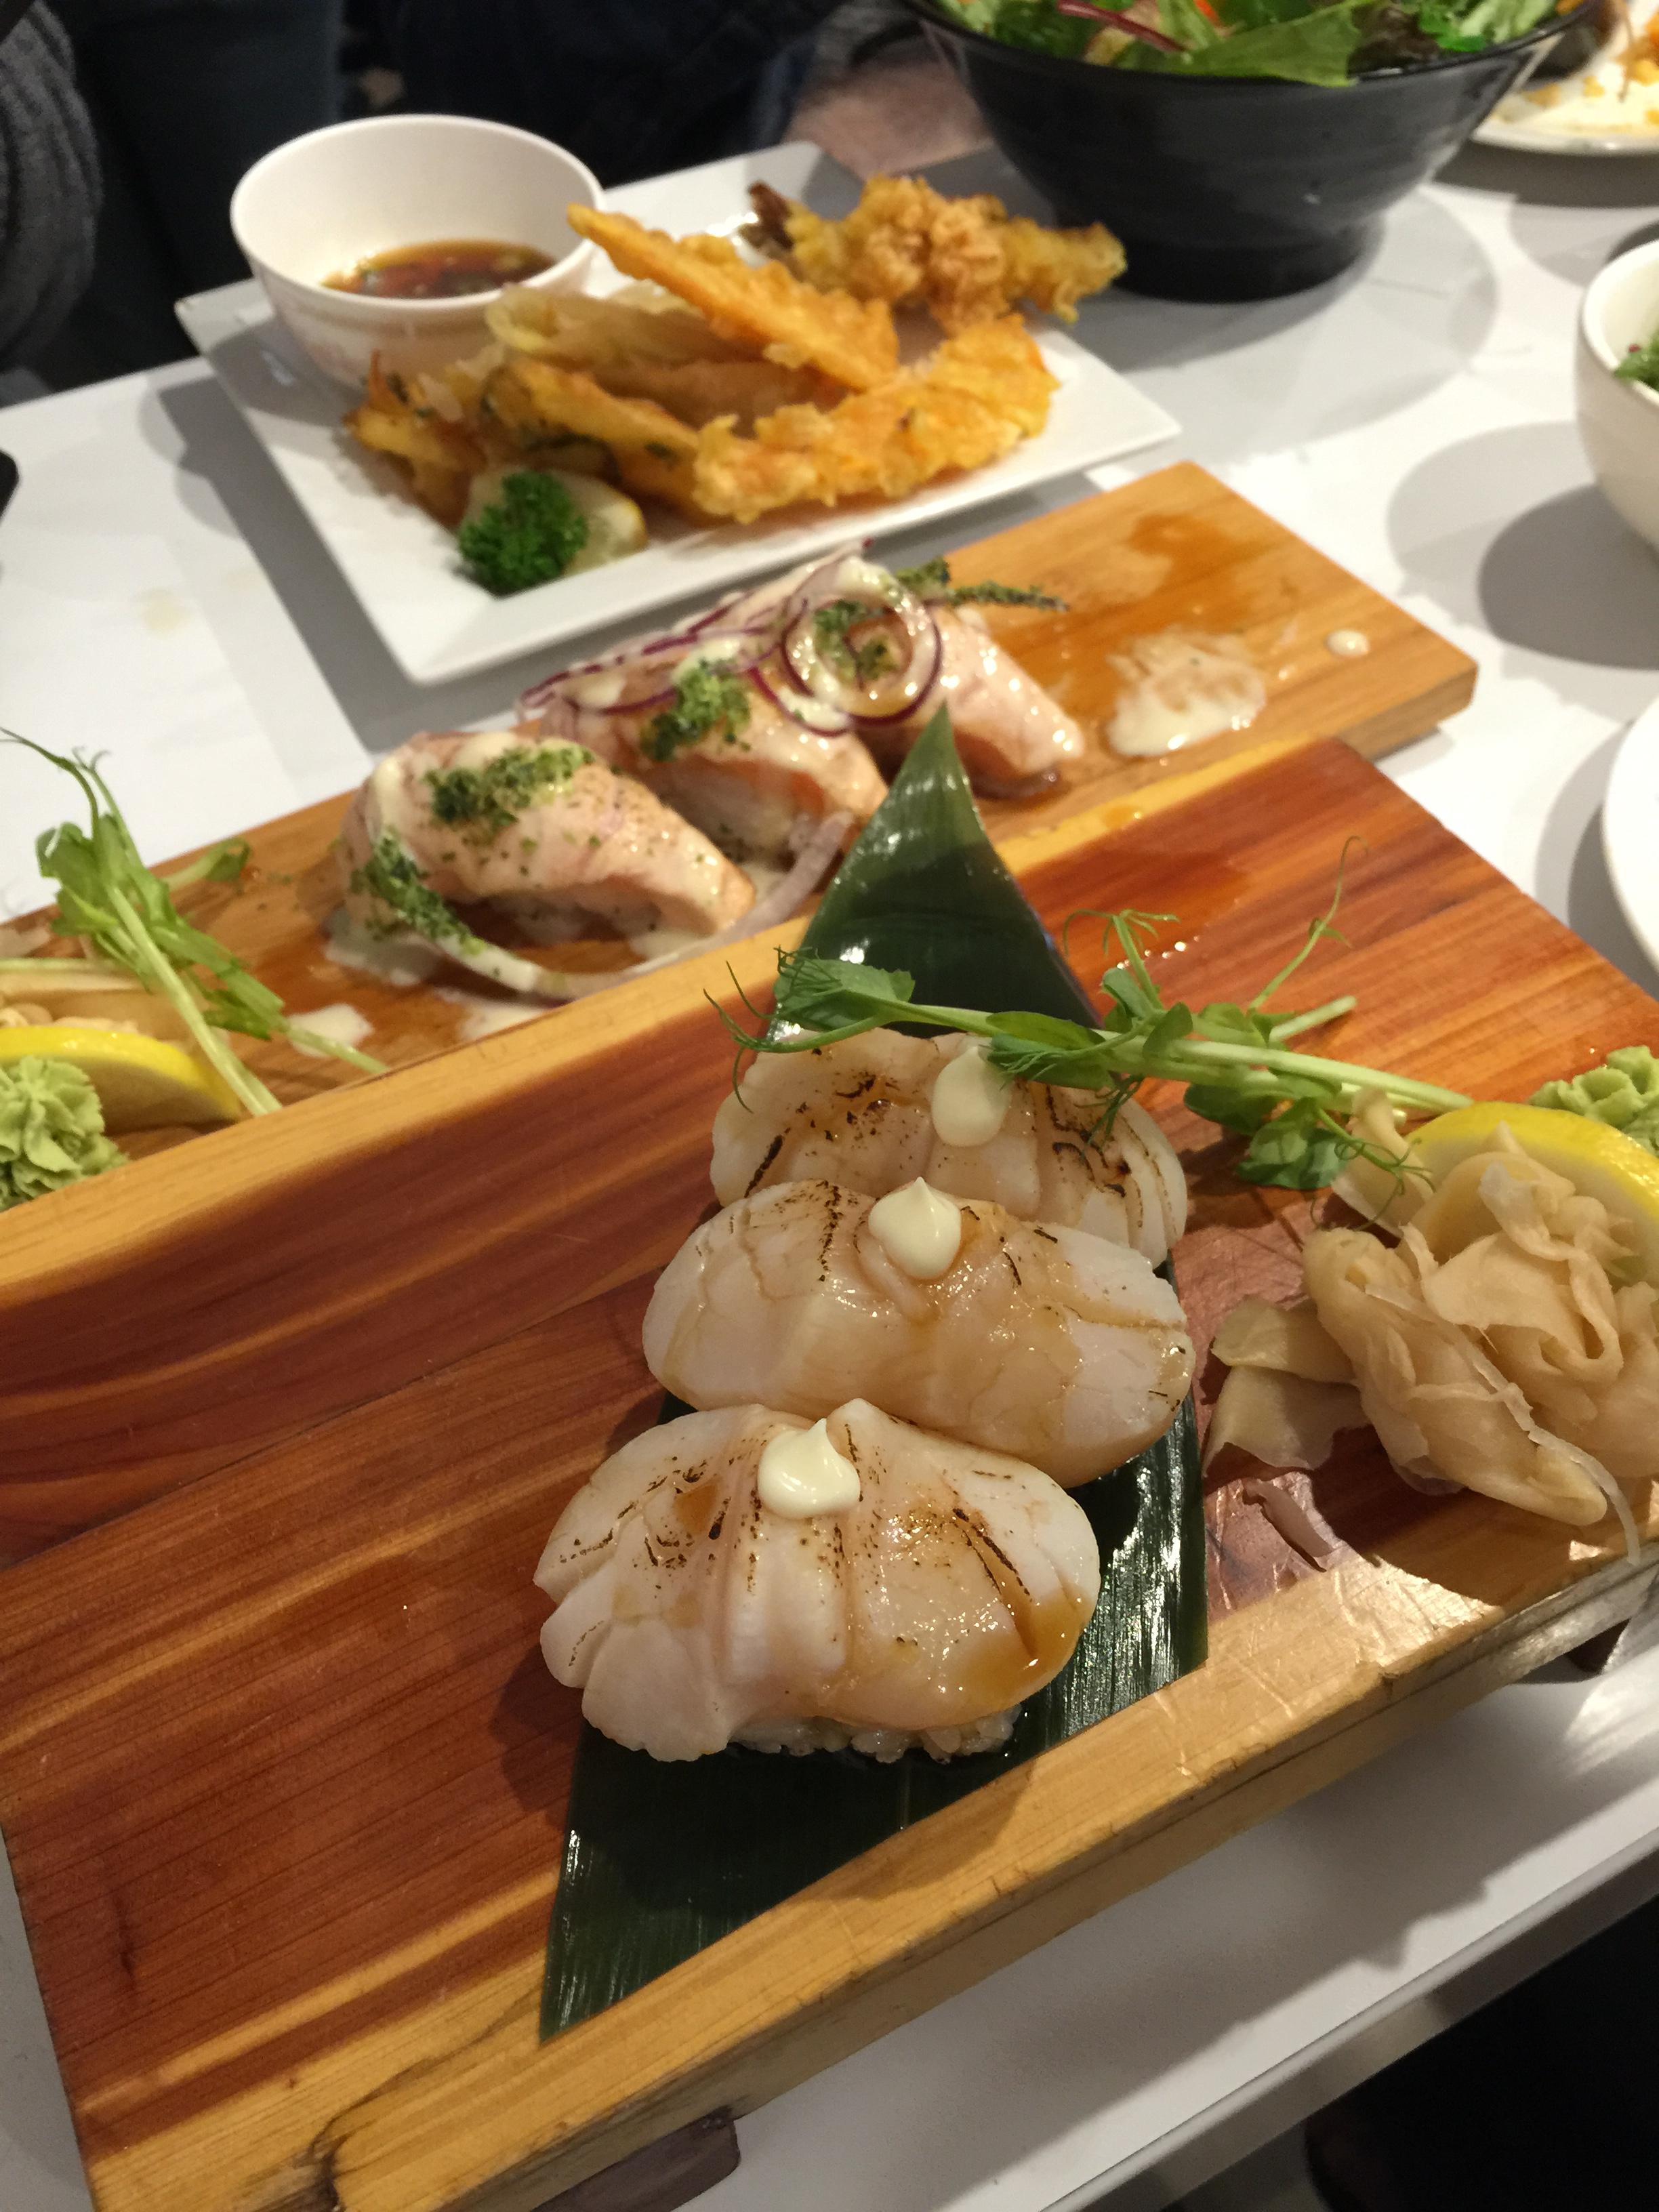 Abrui scallops & salmon (half eaten)